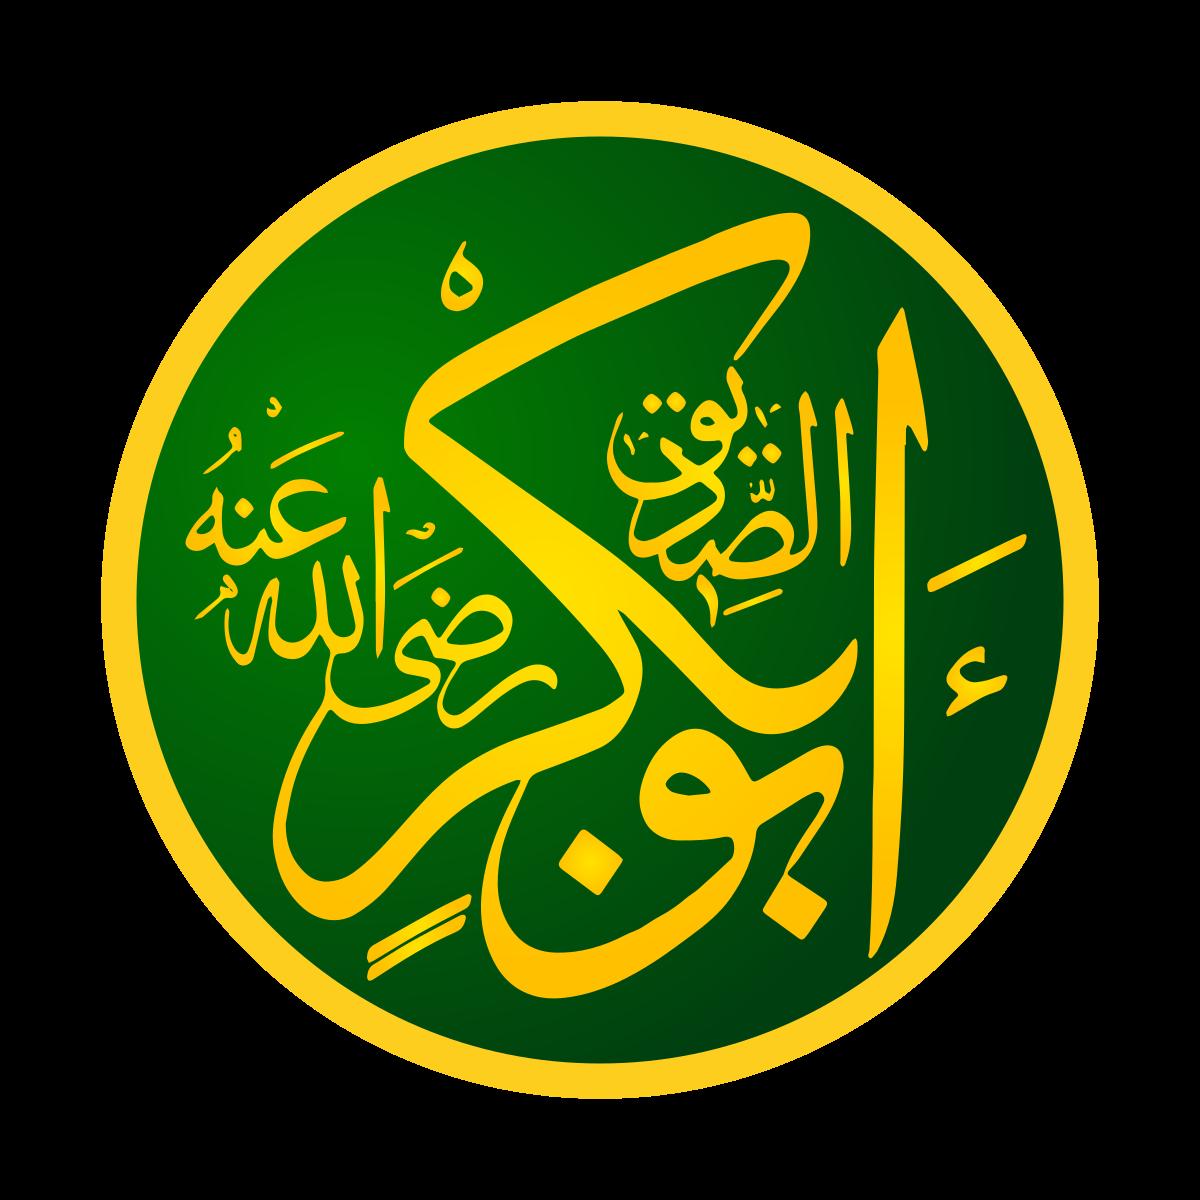 Abu Bakr Wikipedia Seni kaligrafi, Sahabat, Kaligrafi